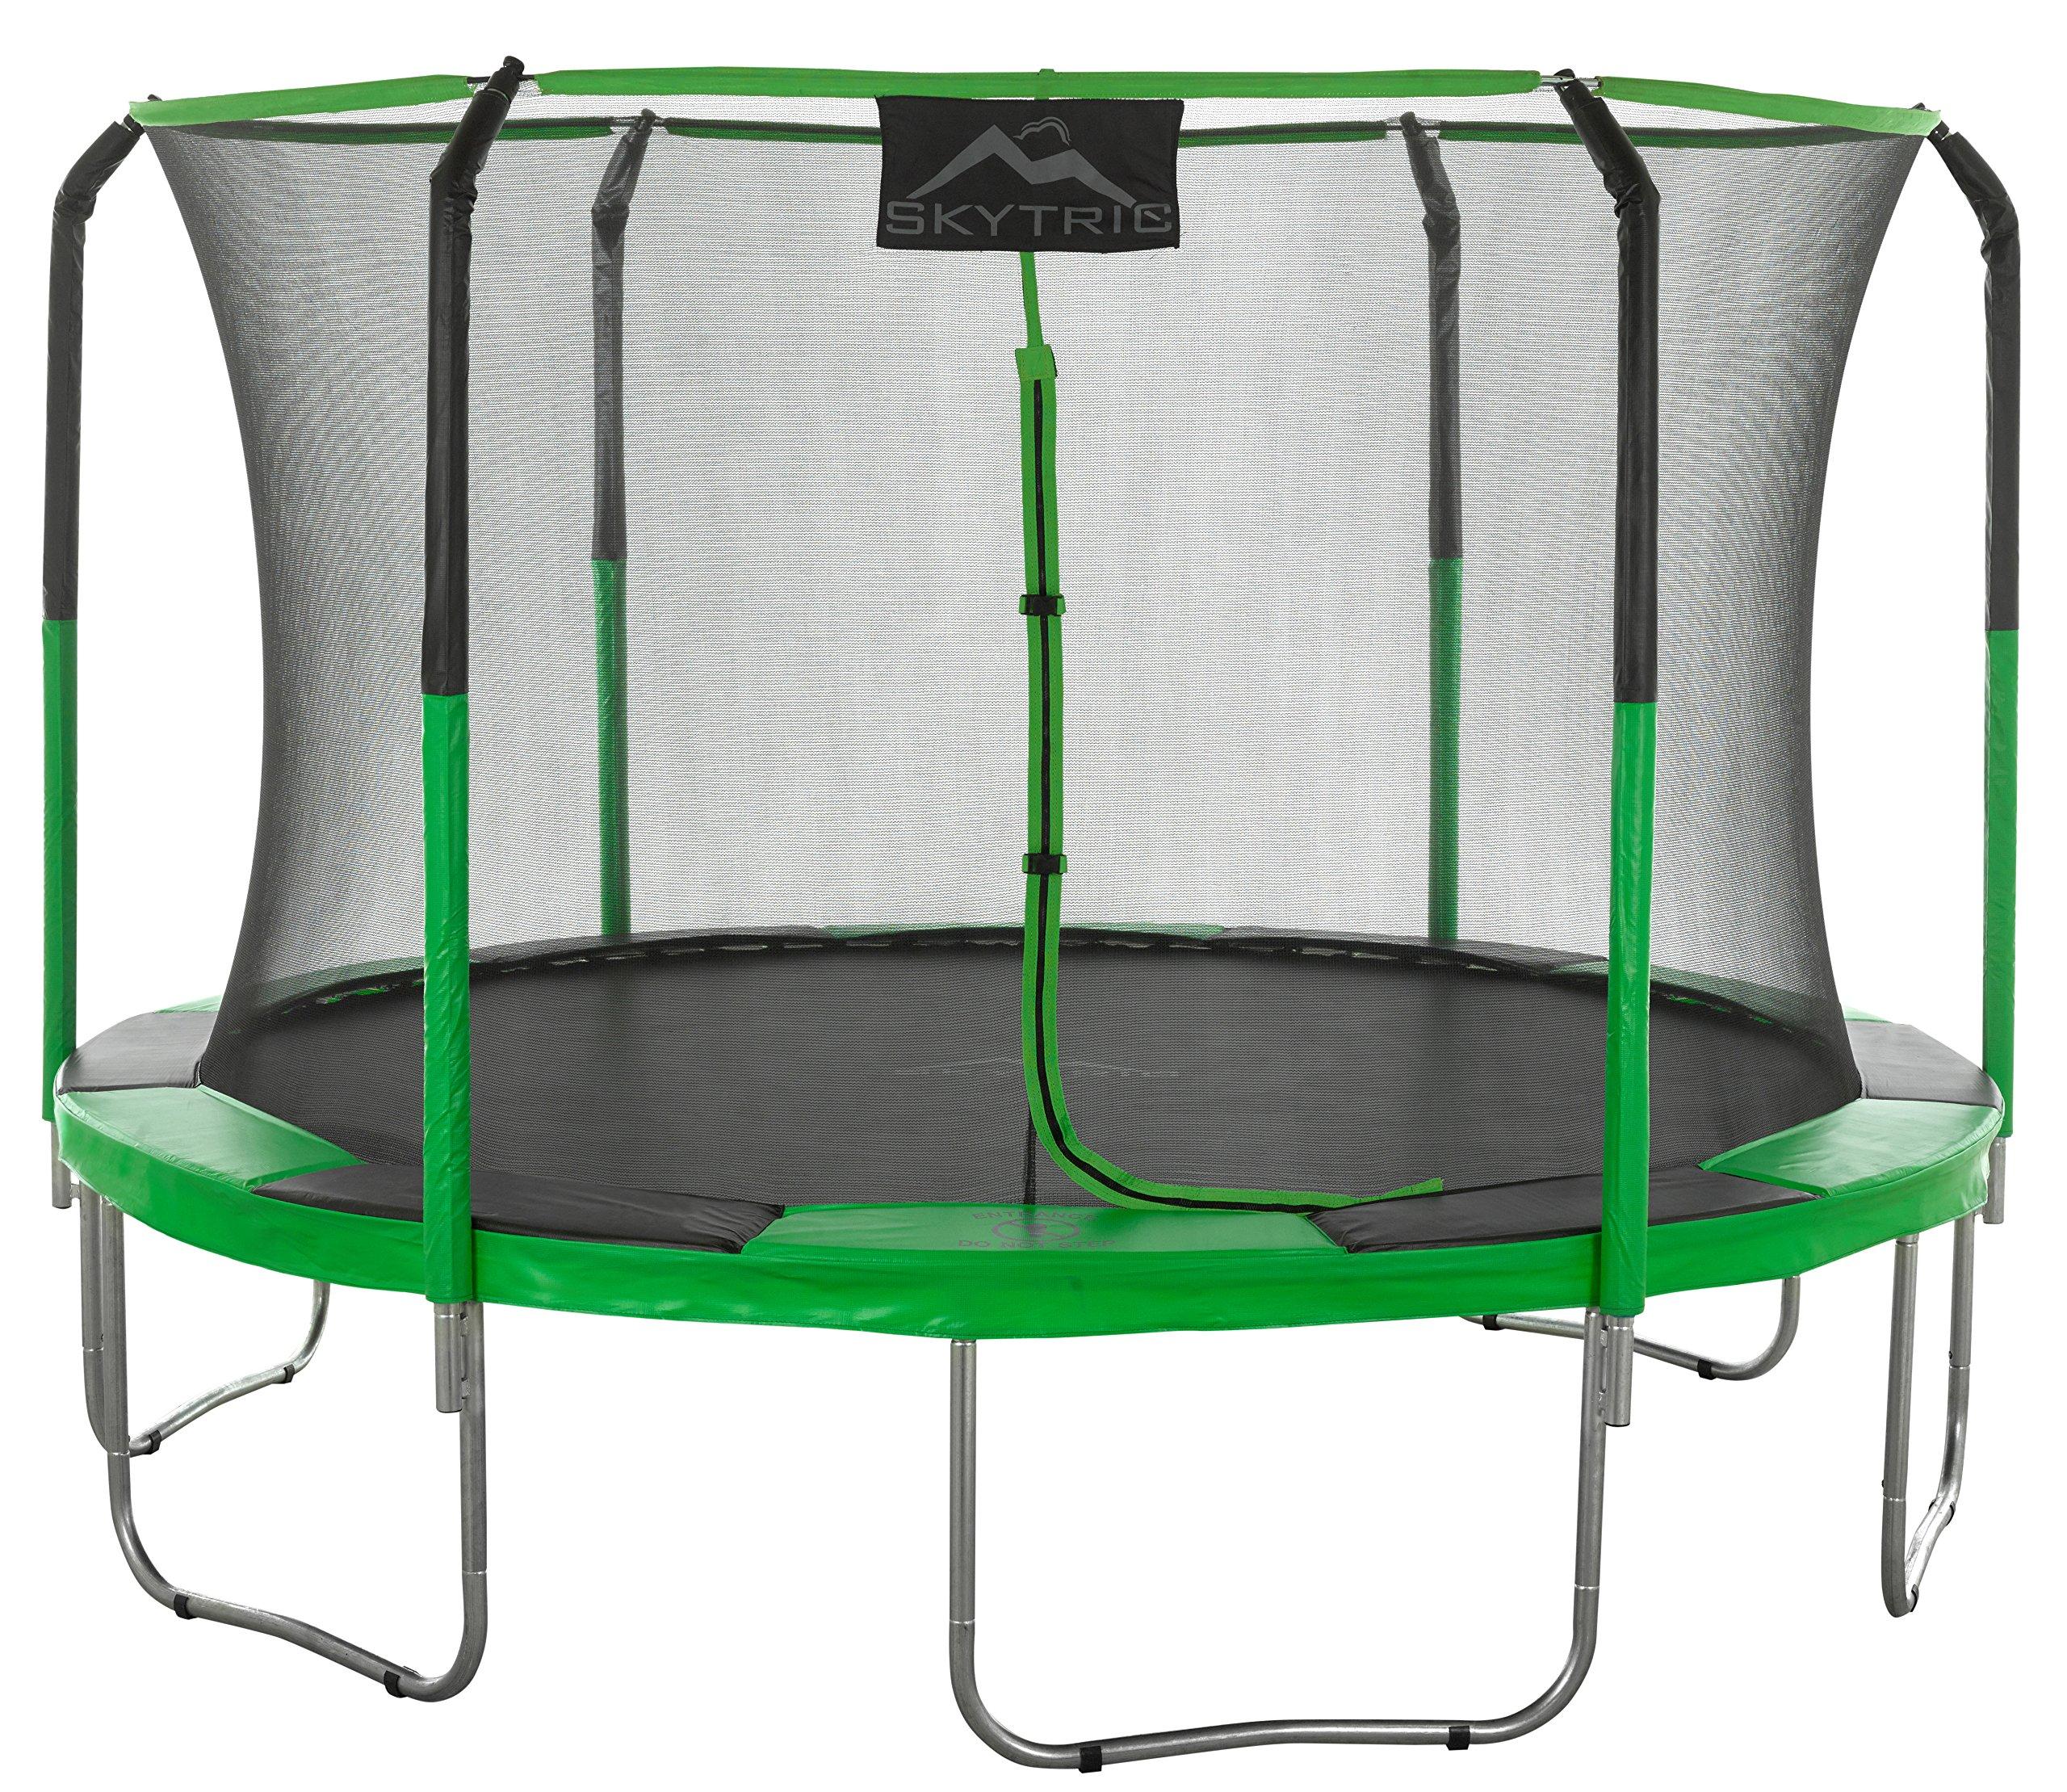 SKYTRIC Trampoline & Enclosure Set, 11'